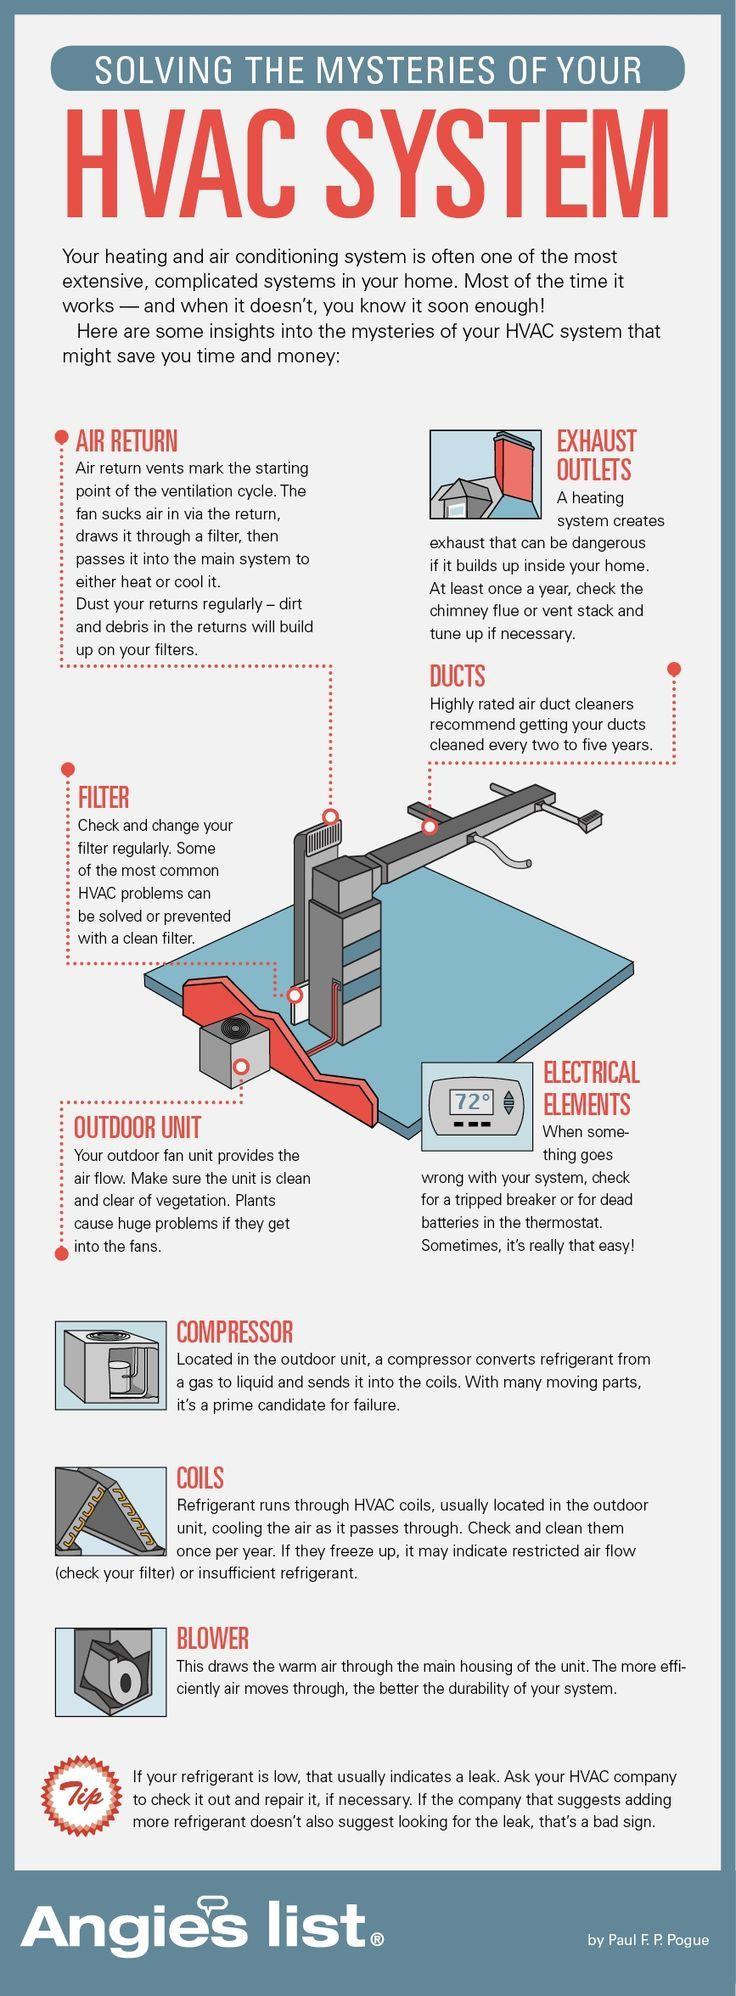 How Does My Hvac System Work Hvac Maintenance Heating And Air